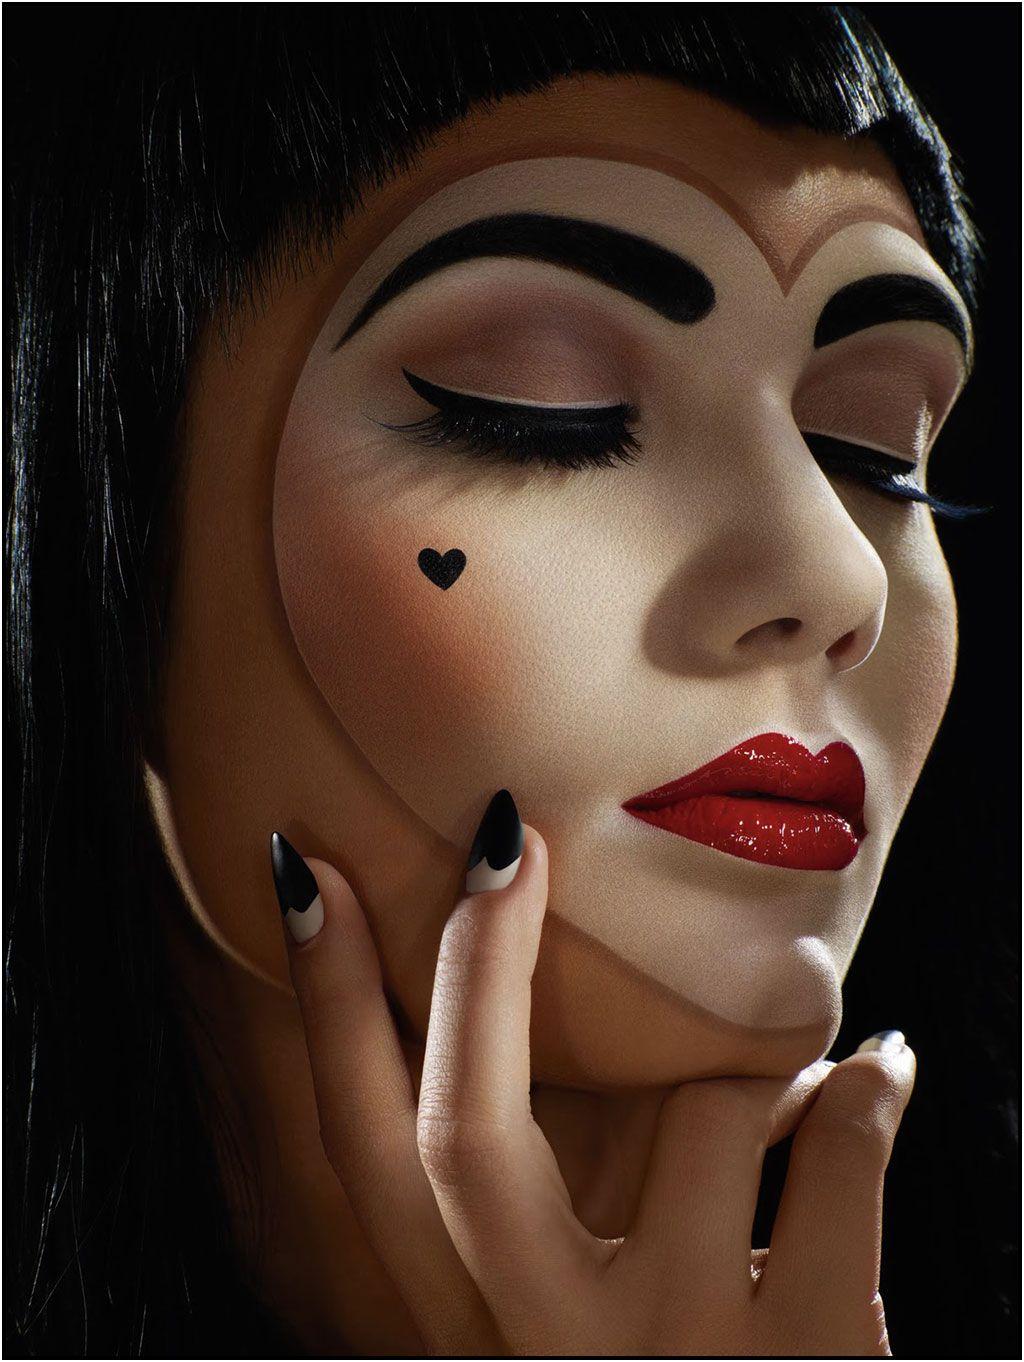 heart harlequin makeup fantasy cosplay pinterest harlequin makeup makeup and halloween. Black Bedroom Furniture Sets. Home Design Ideas